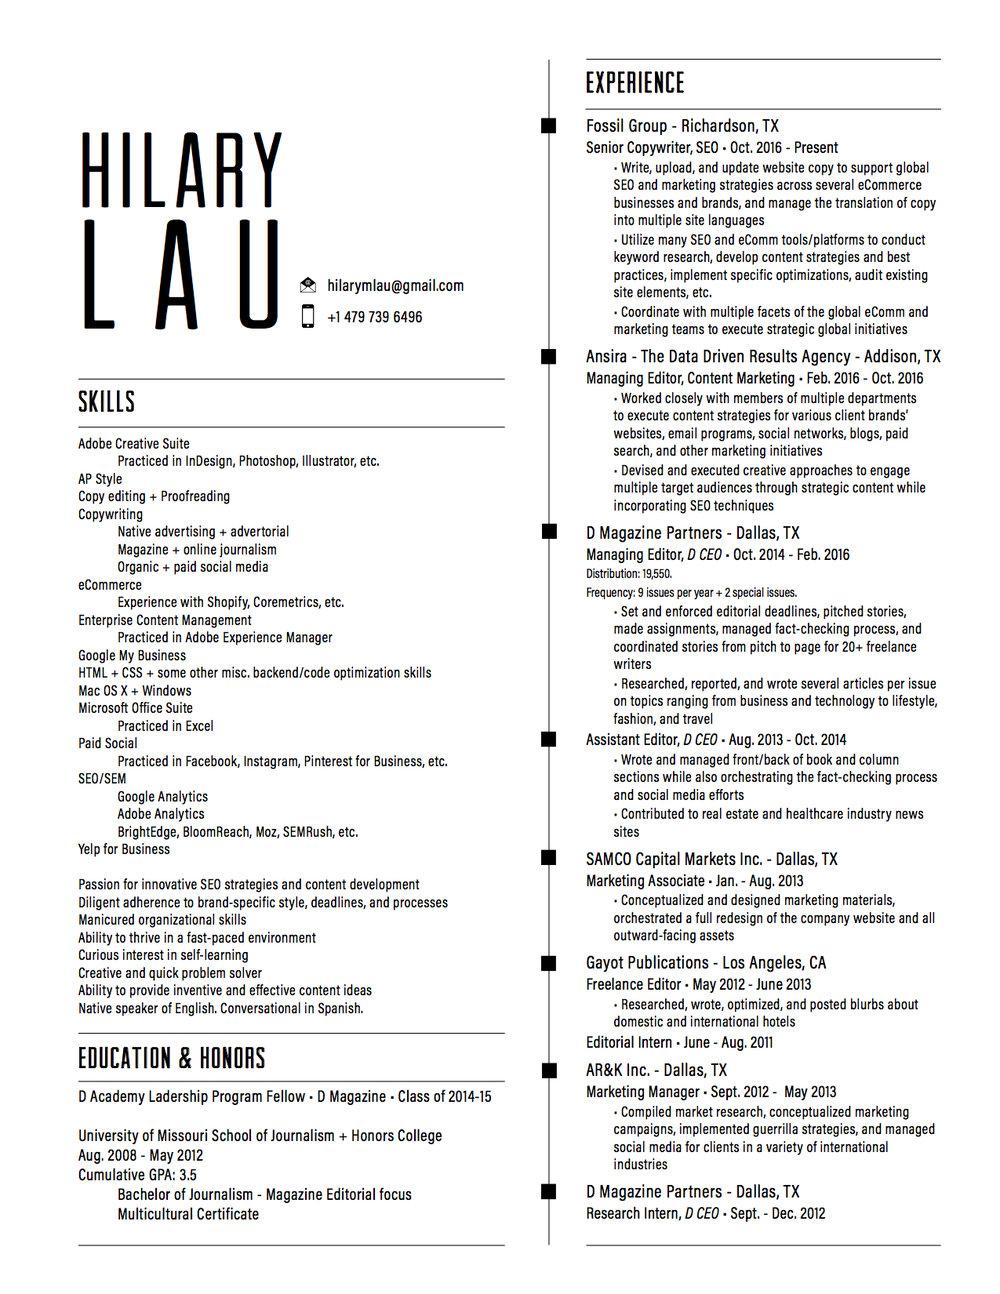 Resume Hilary Lau